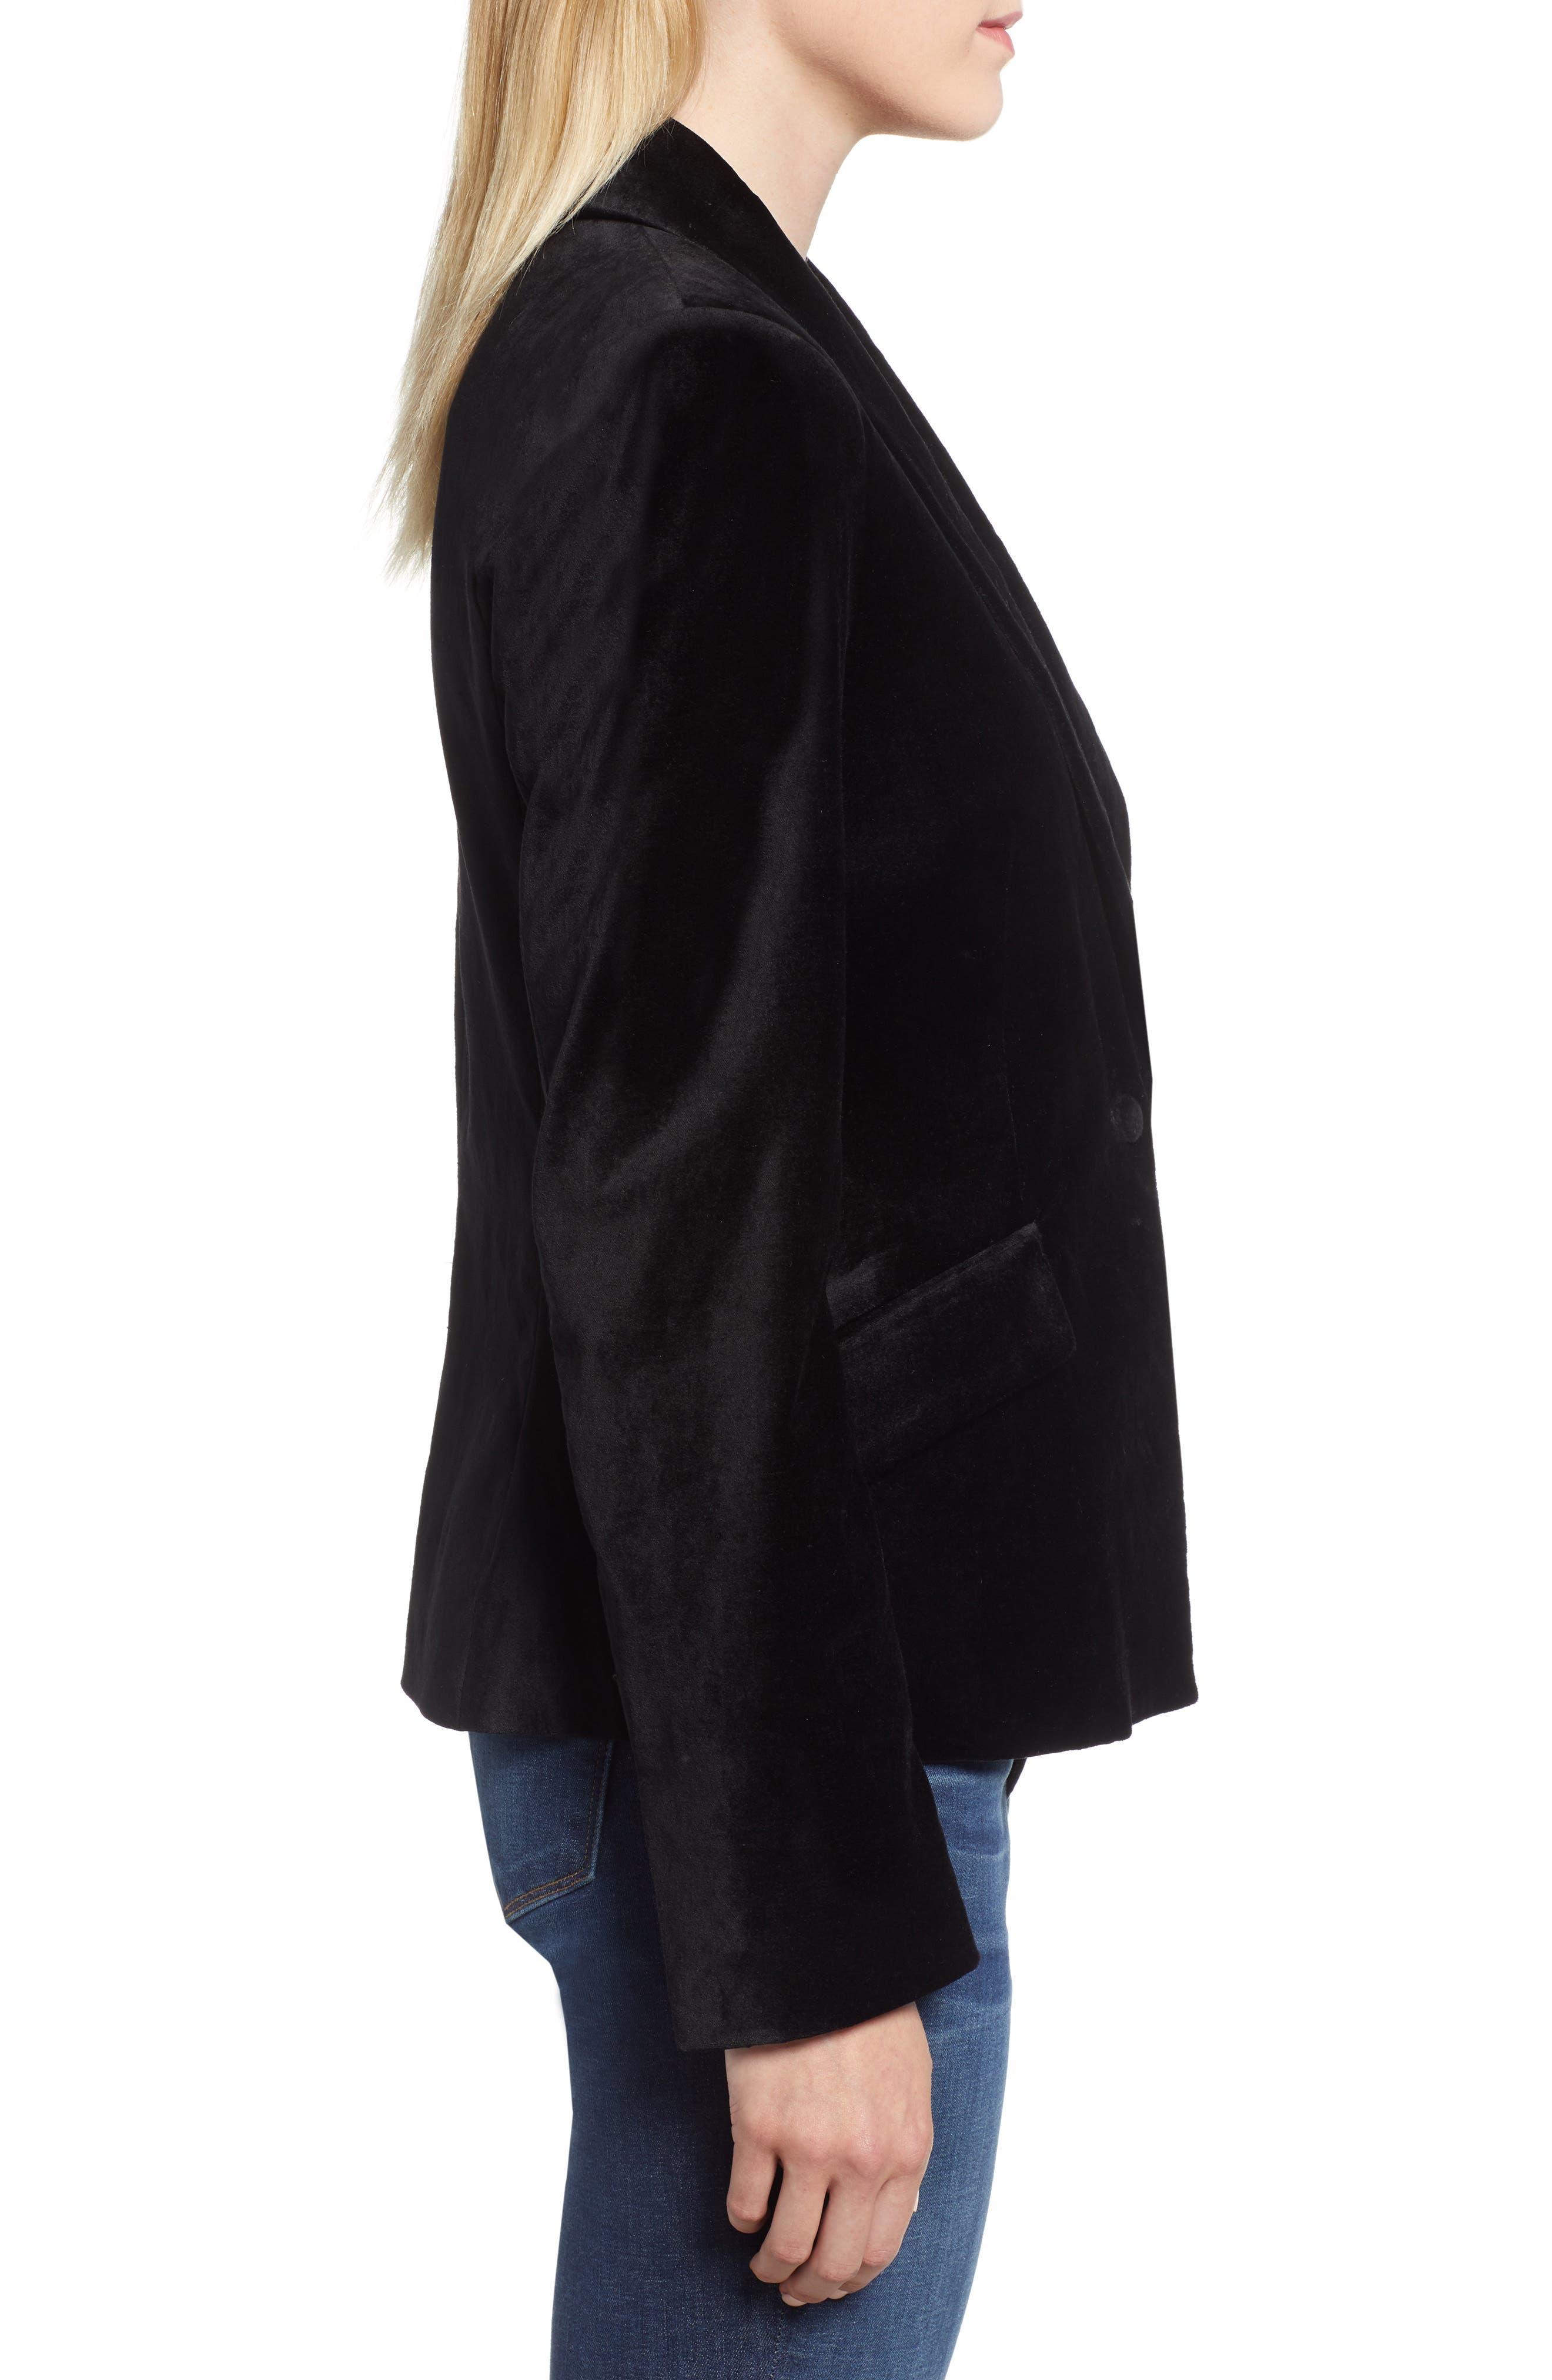 JEN7 BY 7 FOR ALL MANKIND,                             Stretch Cotton Velvet Blazer,                             Alternate thumbnail 3, color,                             BLACK